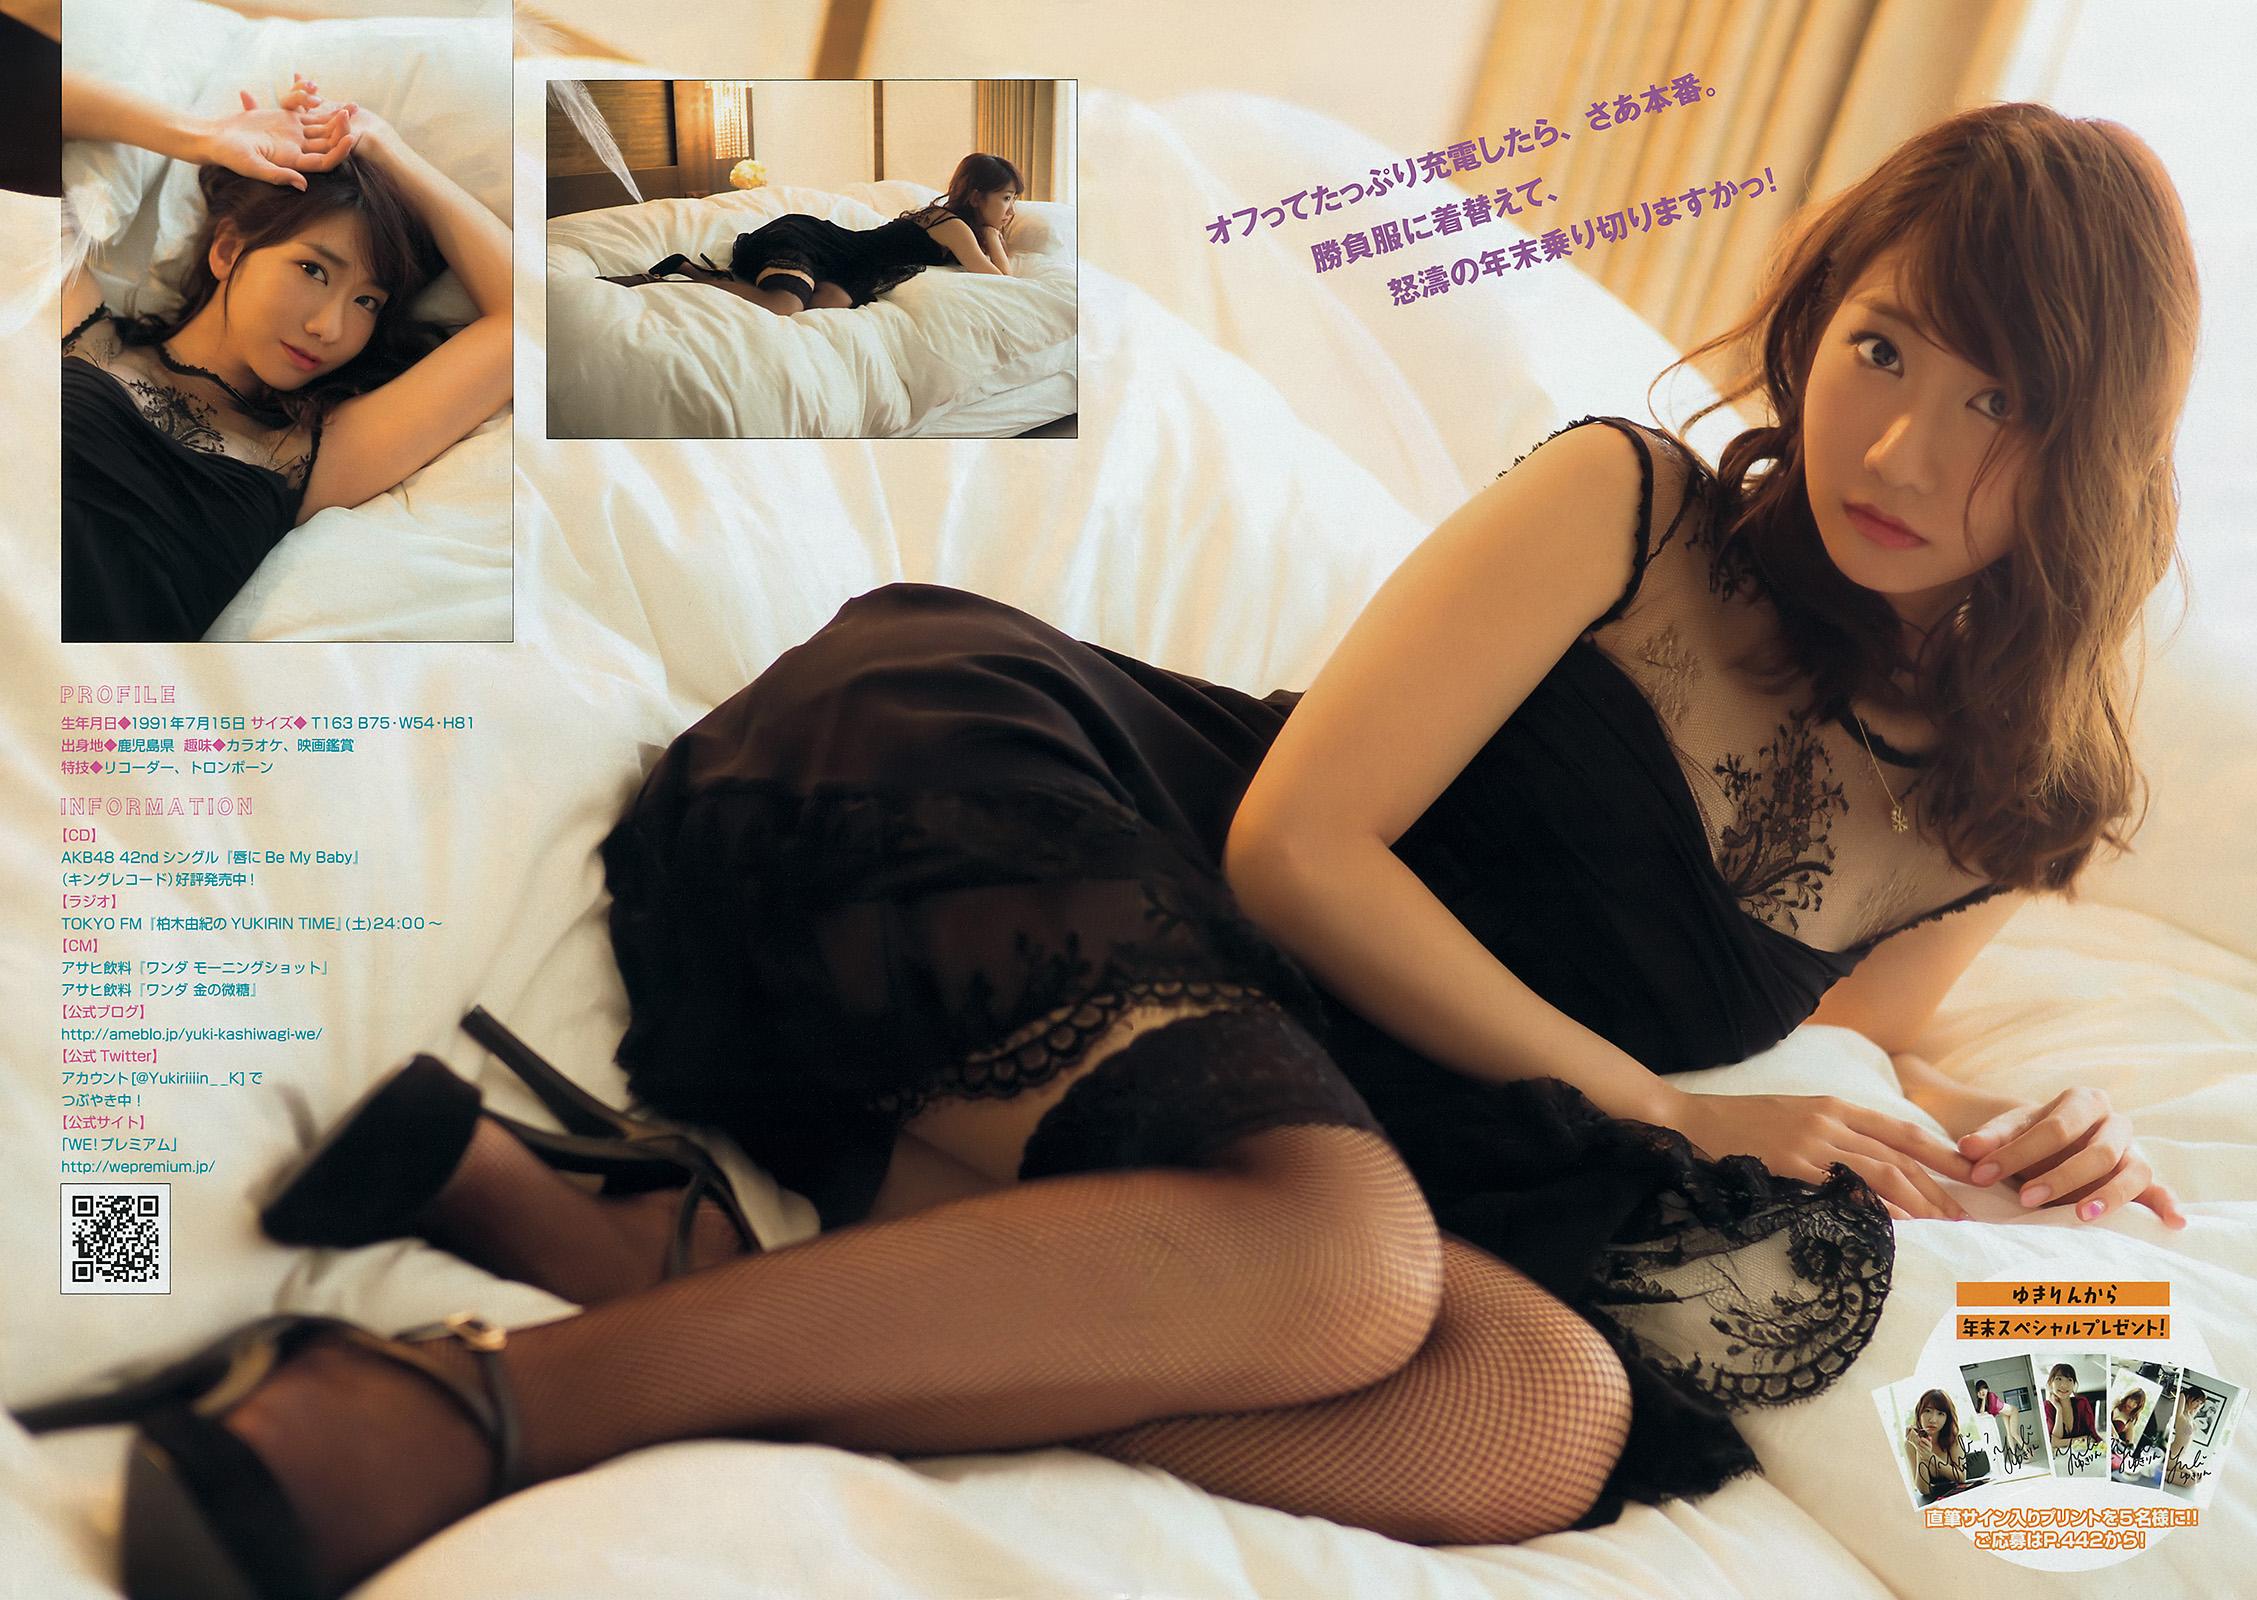 Kashiwagi Yuki 柏木由紀 Young Magazine 2016 No 2 Wallpaper HD